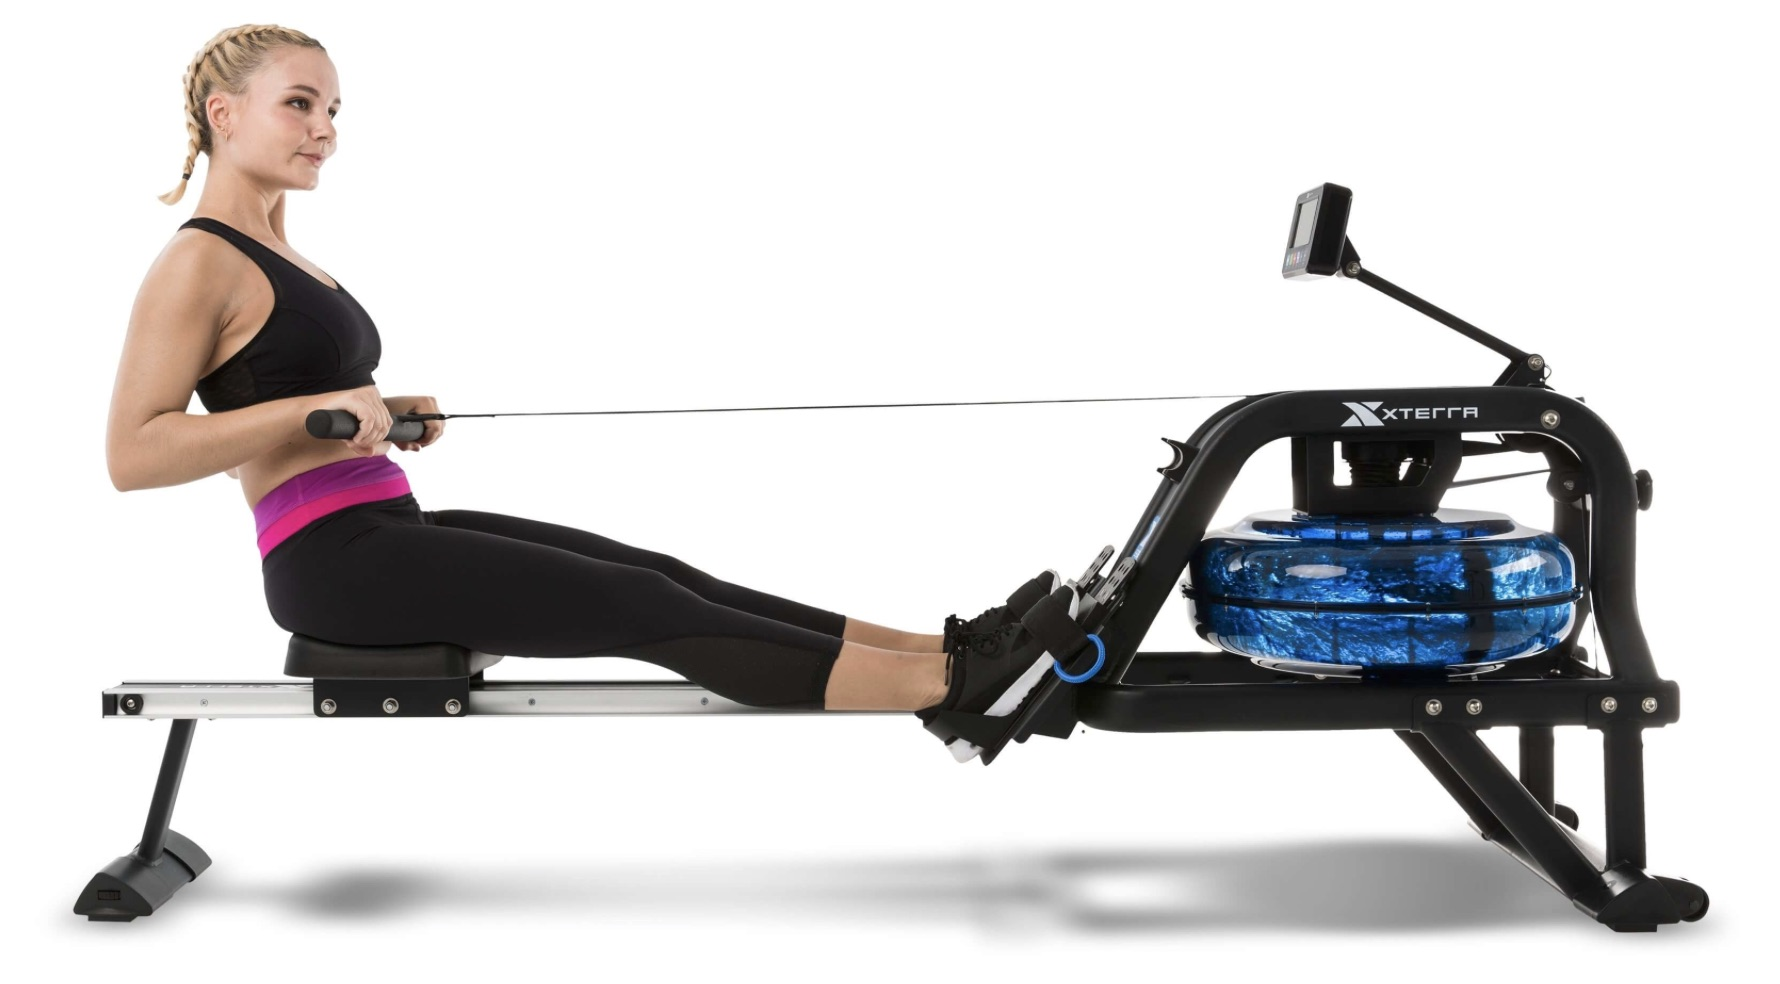 XTERRA Fitness ERG600W Water Rower Capacity